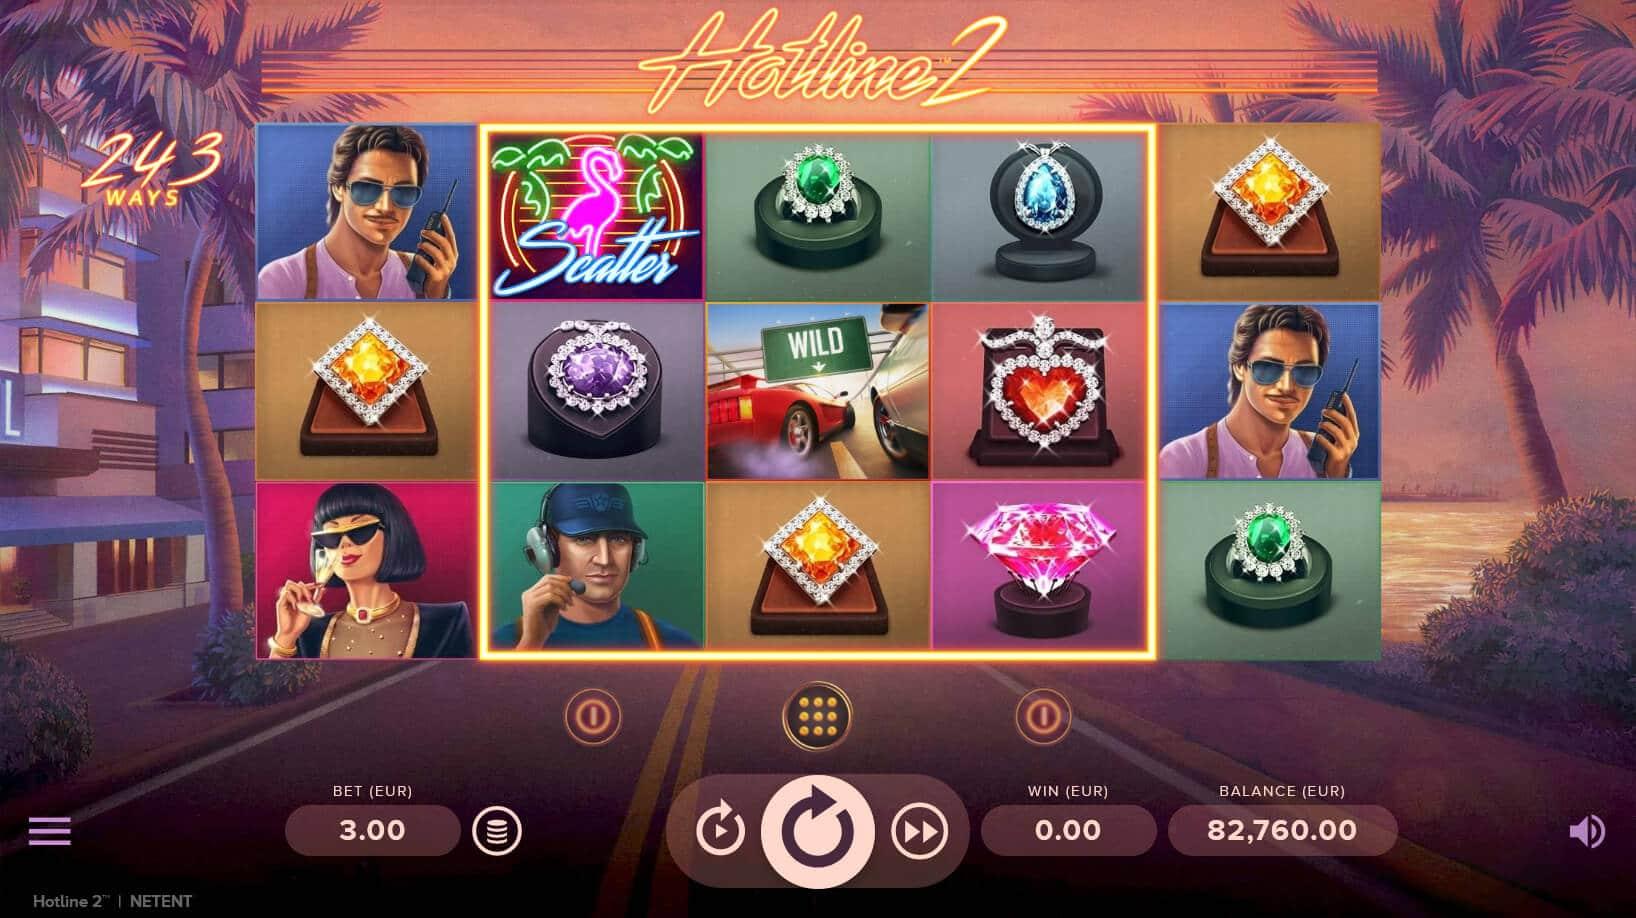 hotline 2 slot bonus